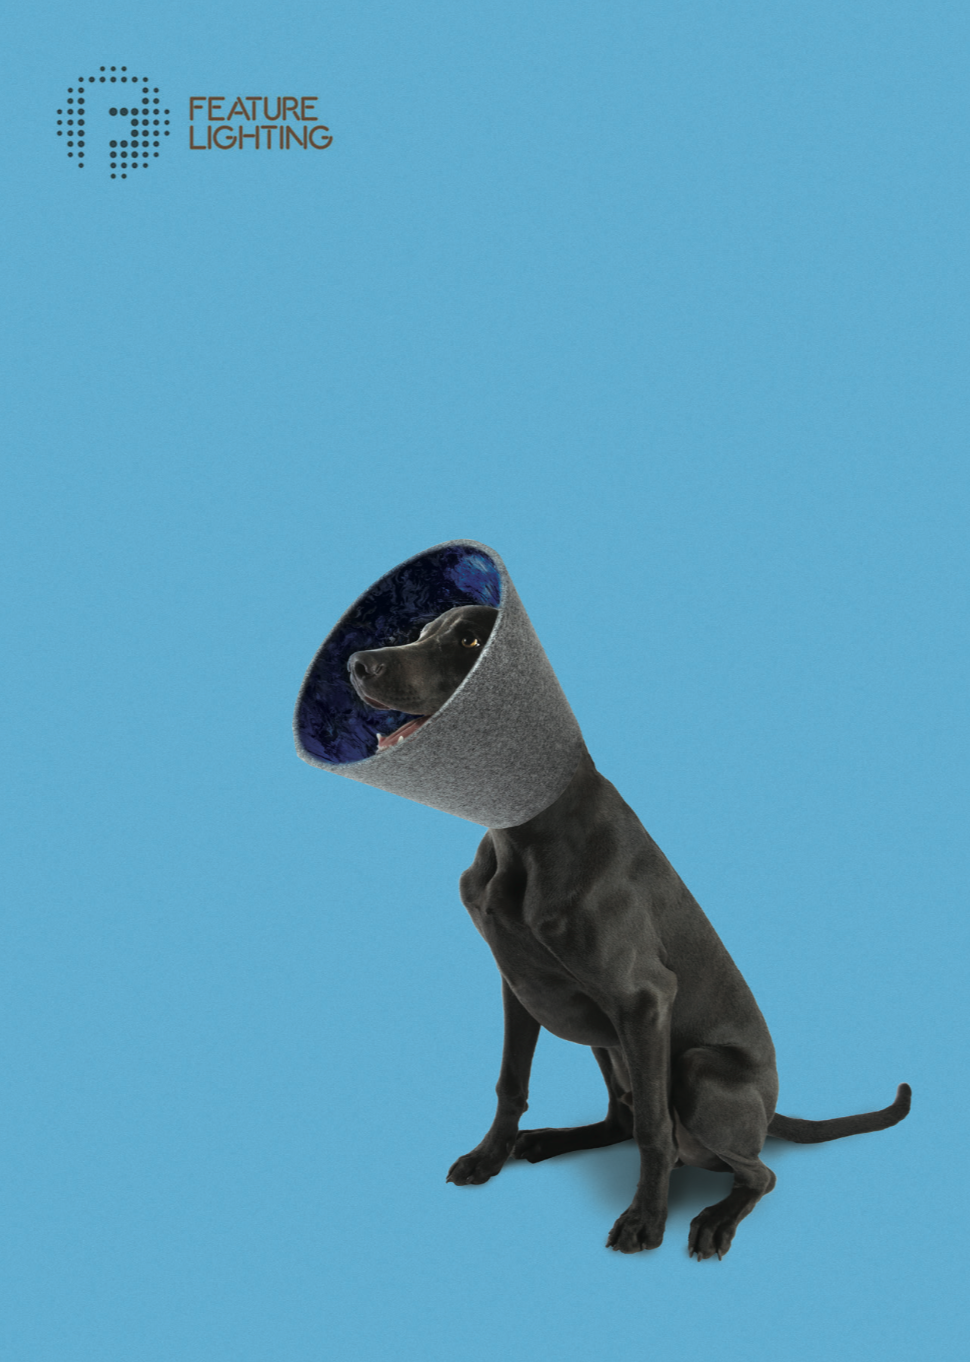 Blu - Doggie Cone of shame lampshades